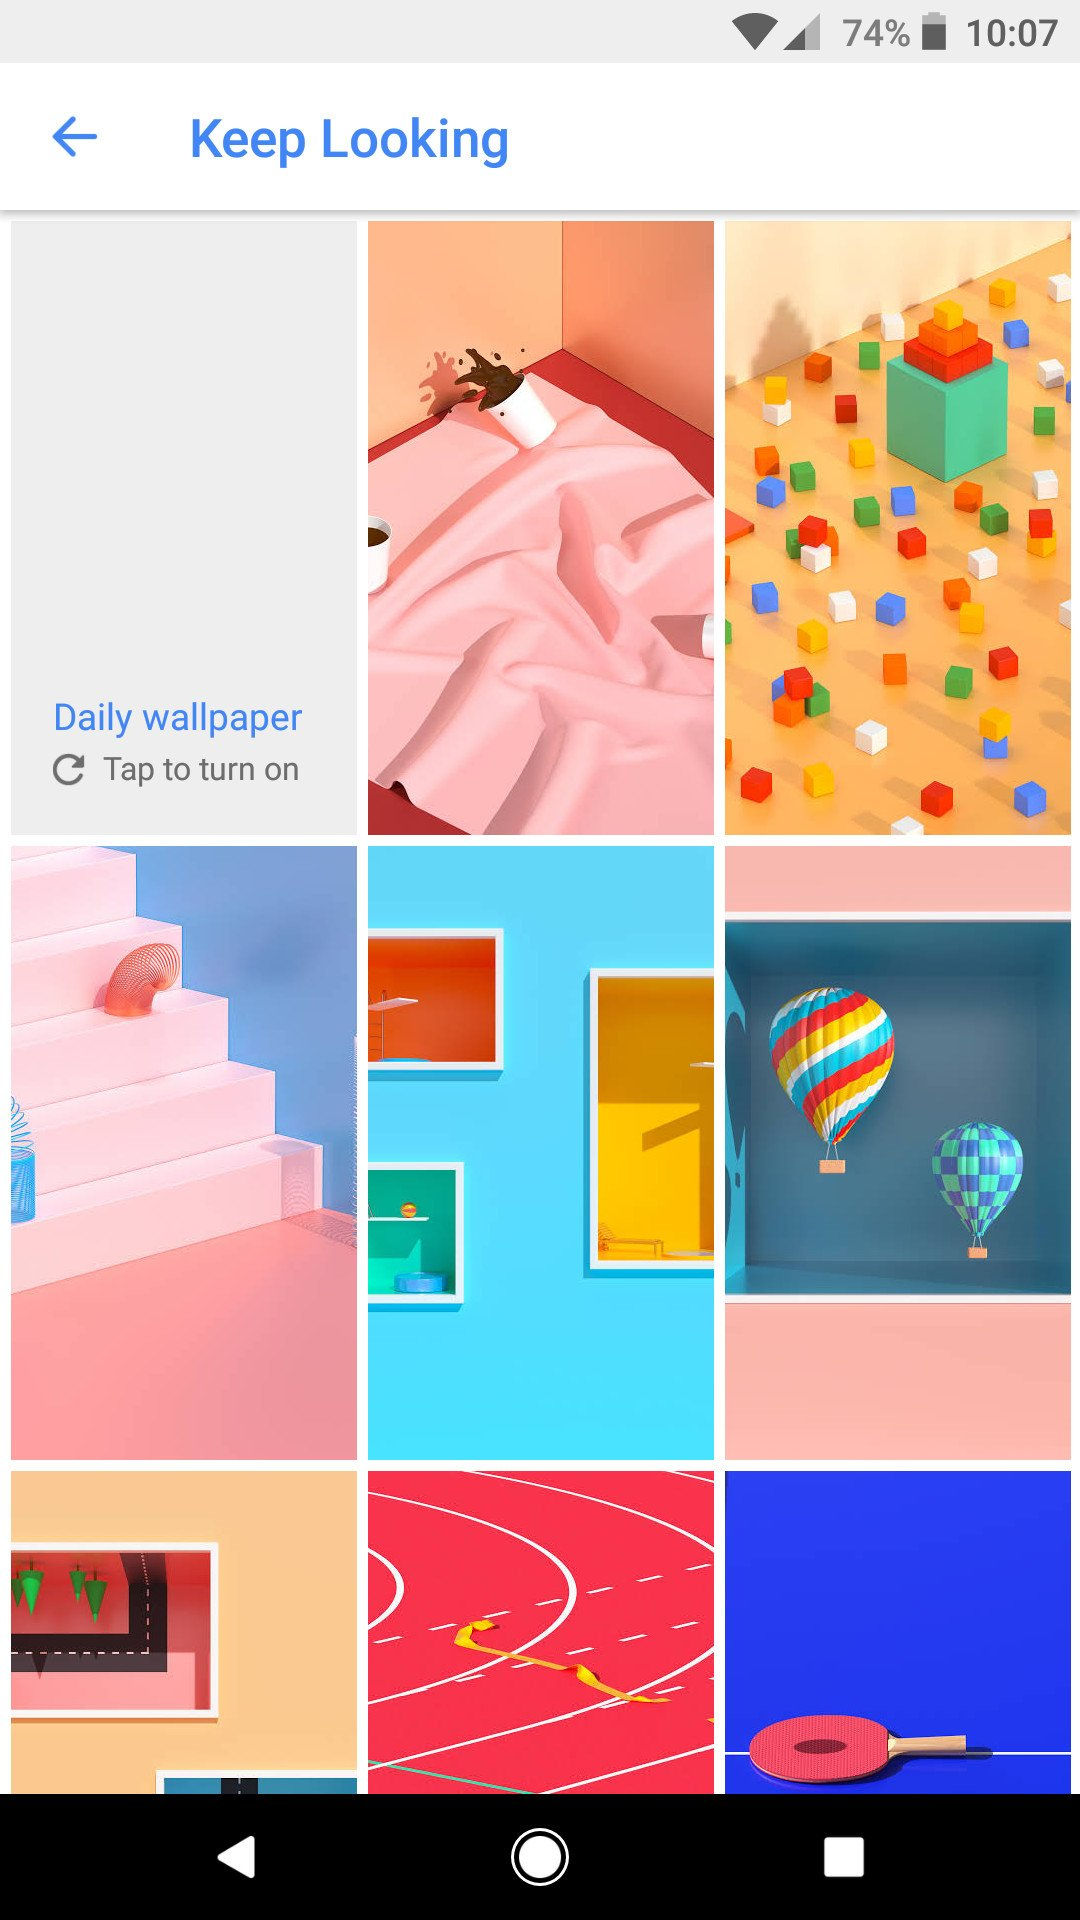 Google Pixel Android 2 Wallpaper